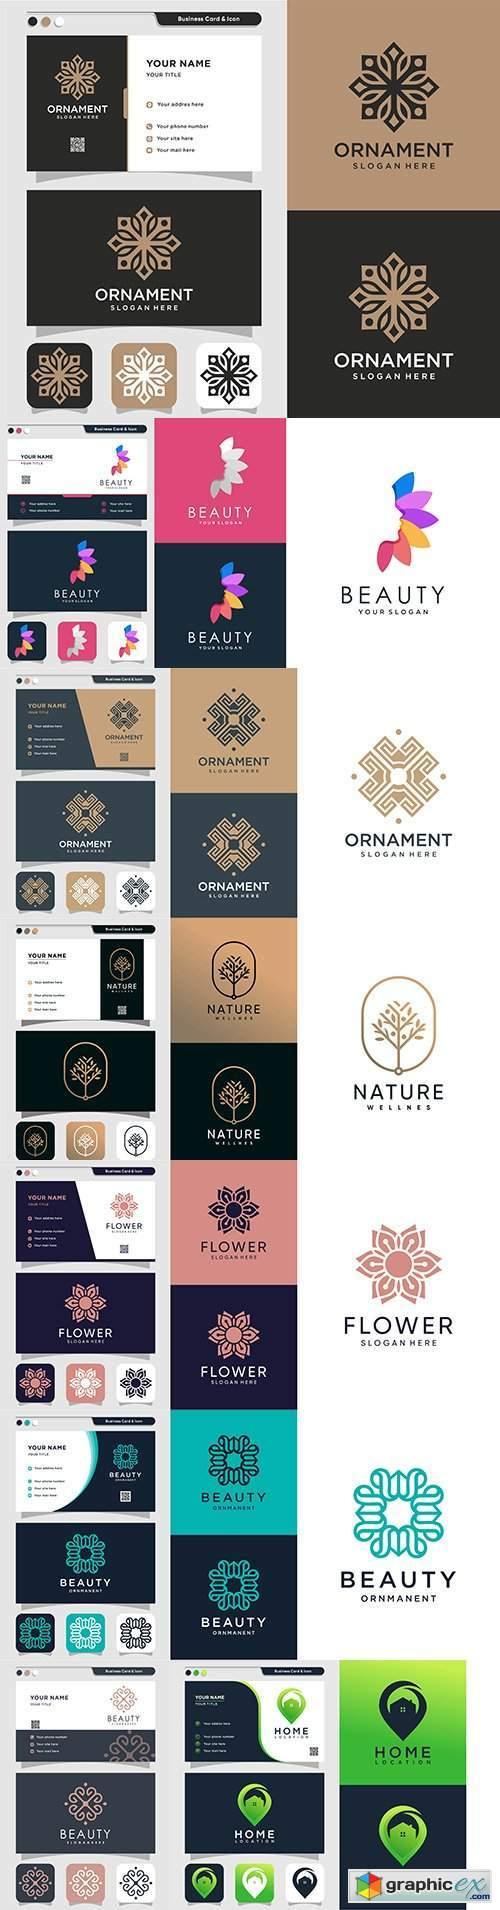 Minimalist elegant logo and business card design 6